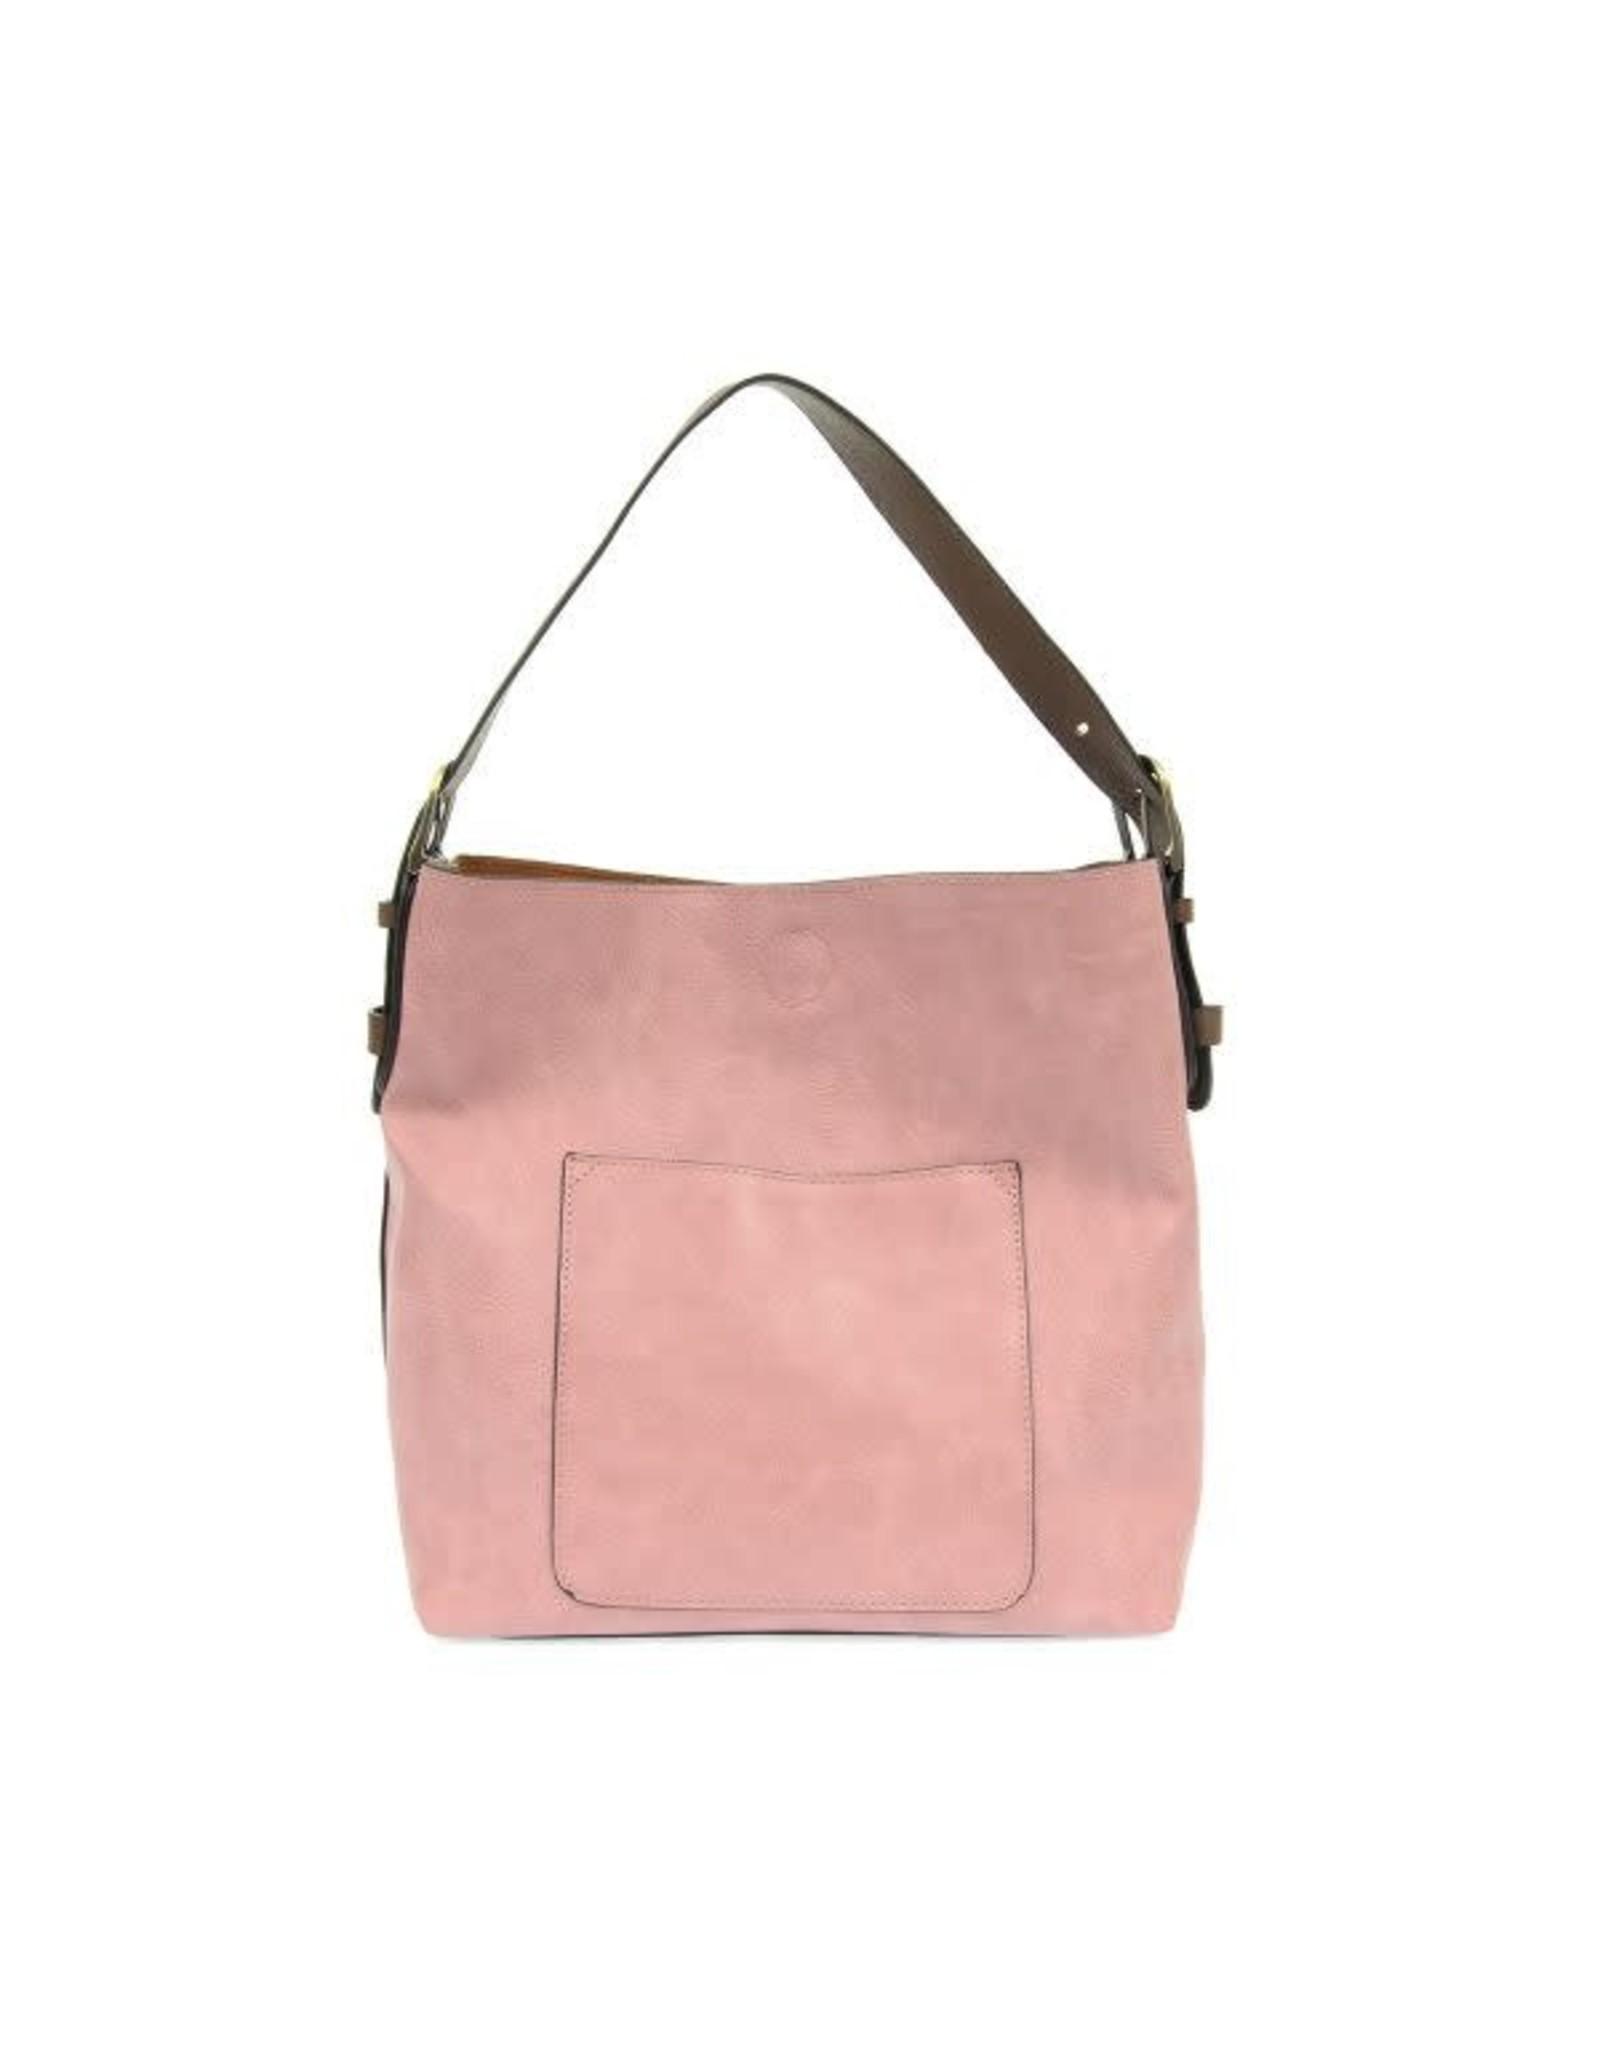 Joy Susan Classic Hobo Bag